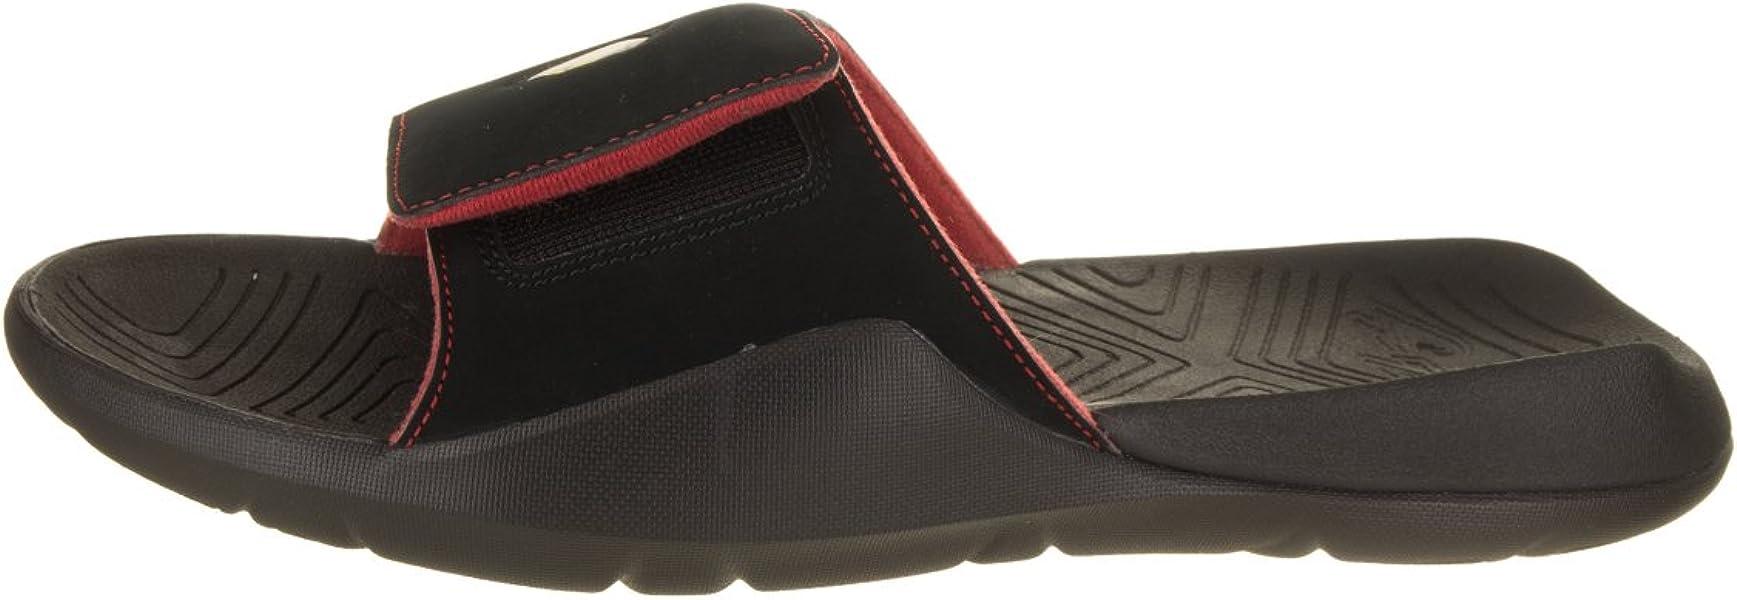 49bee1f00f0259 Jordan AA2517-003  Men s Black Black-Varsity Jordan Hydro 7 Retro ...